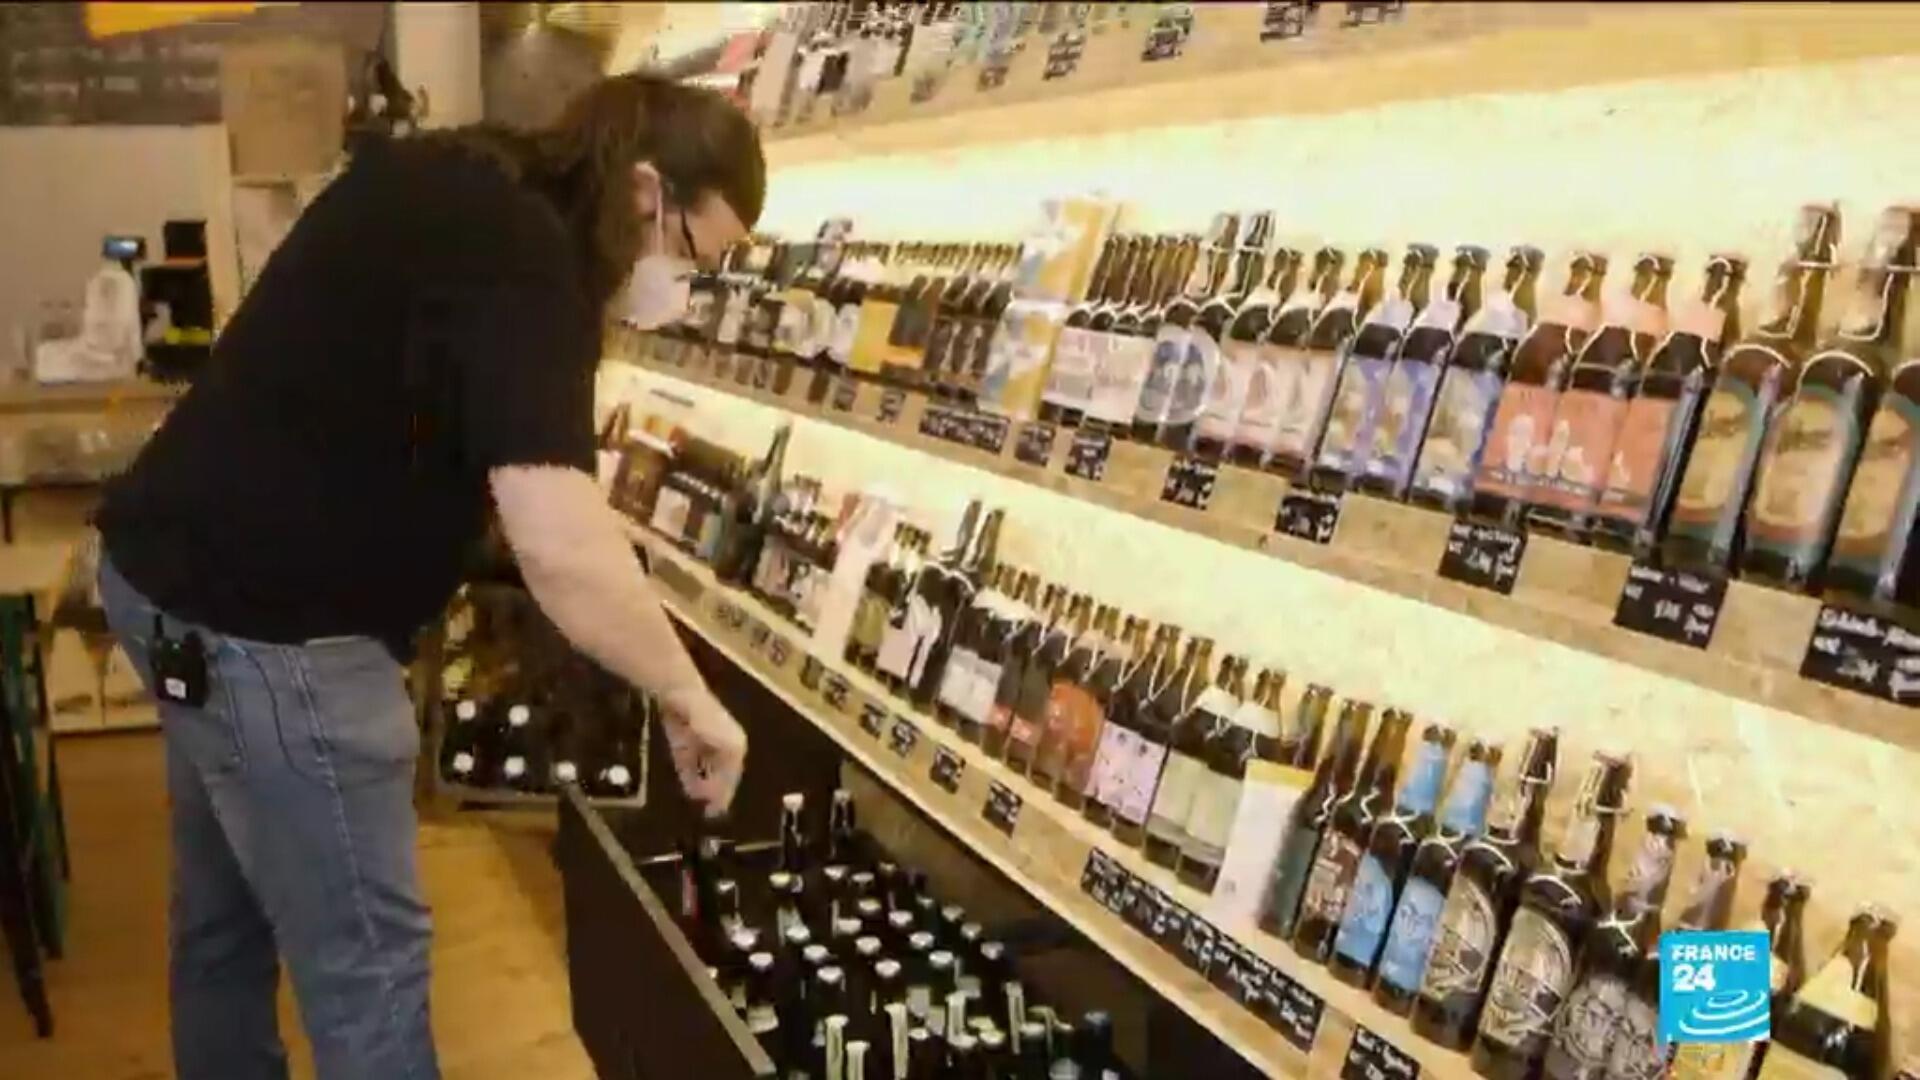 Biere allemagne covid-19